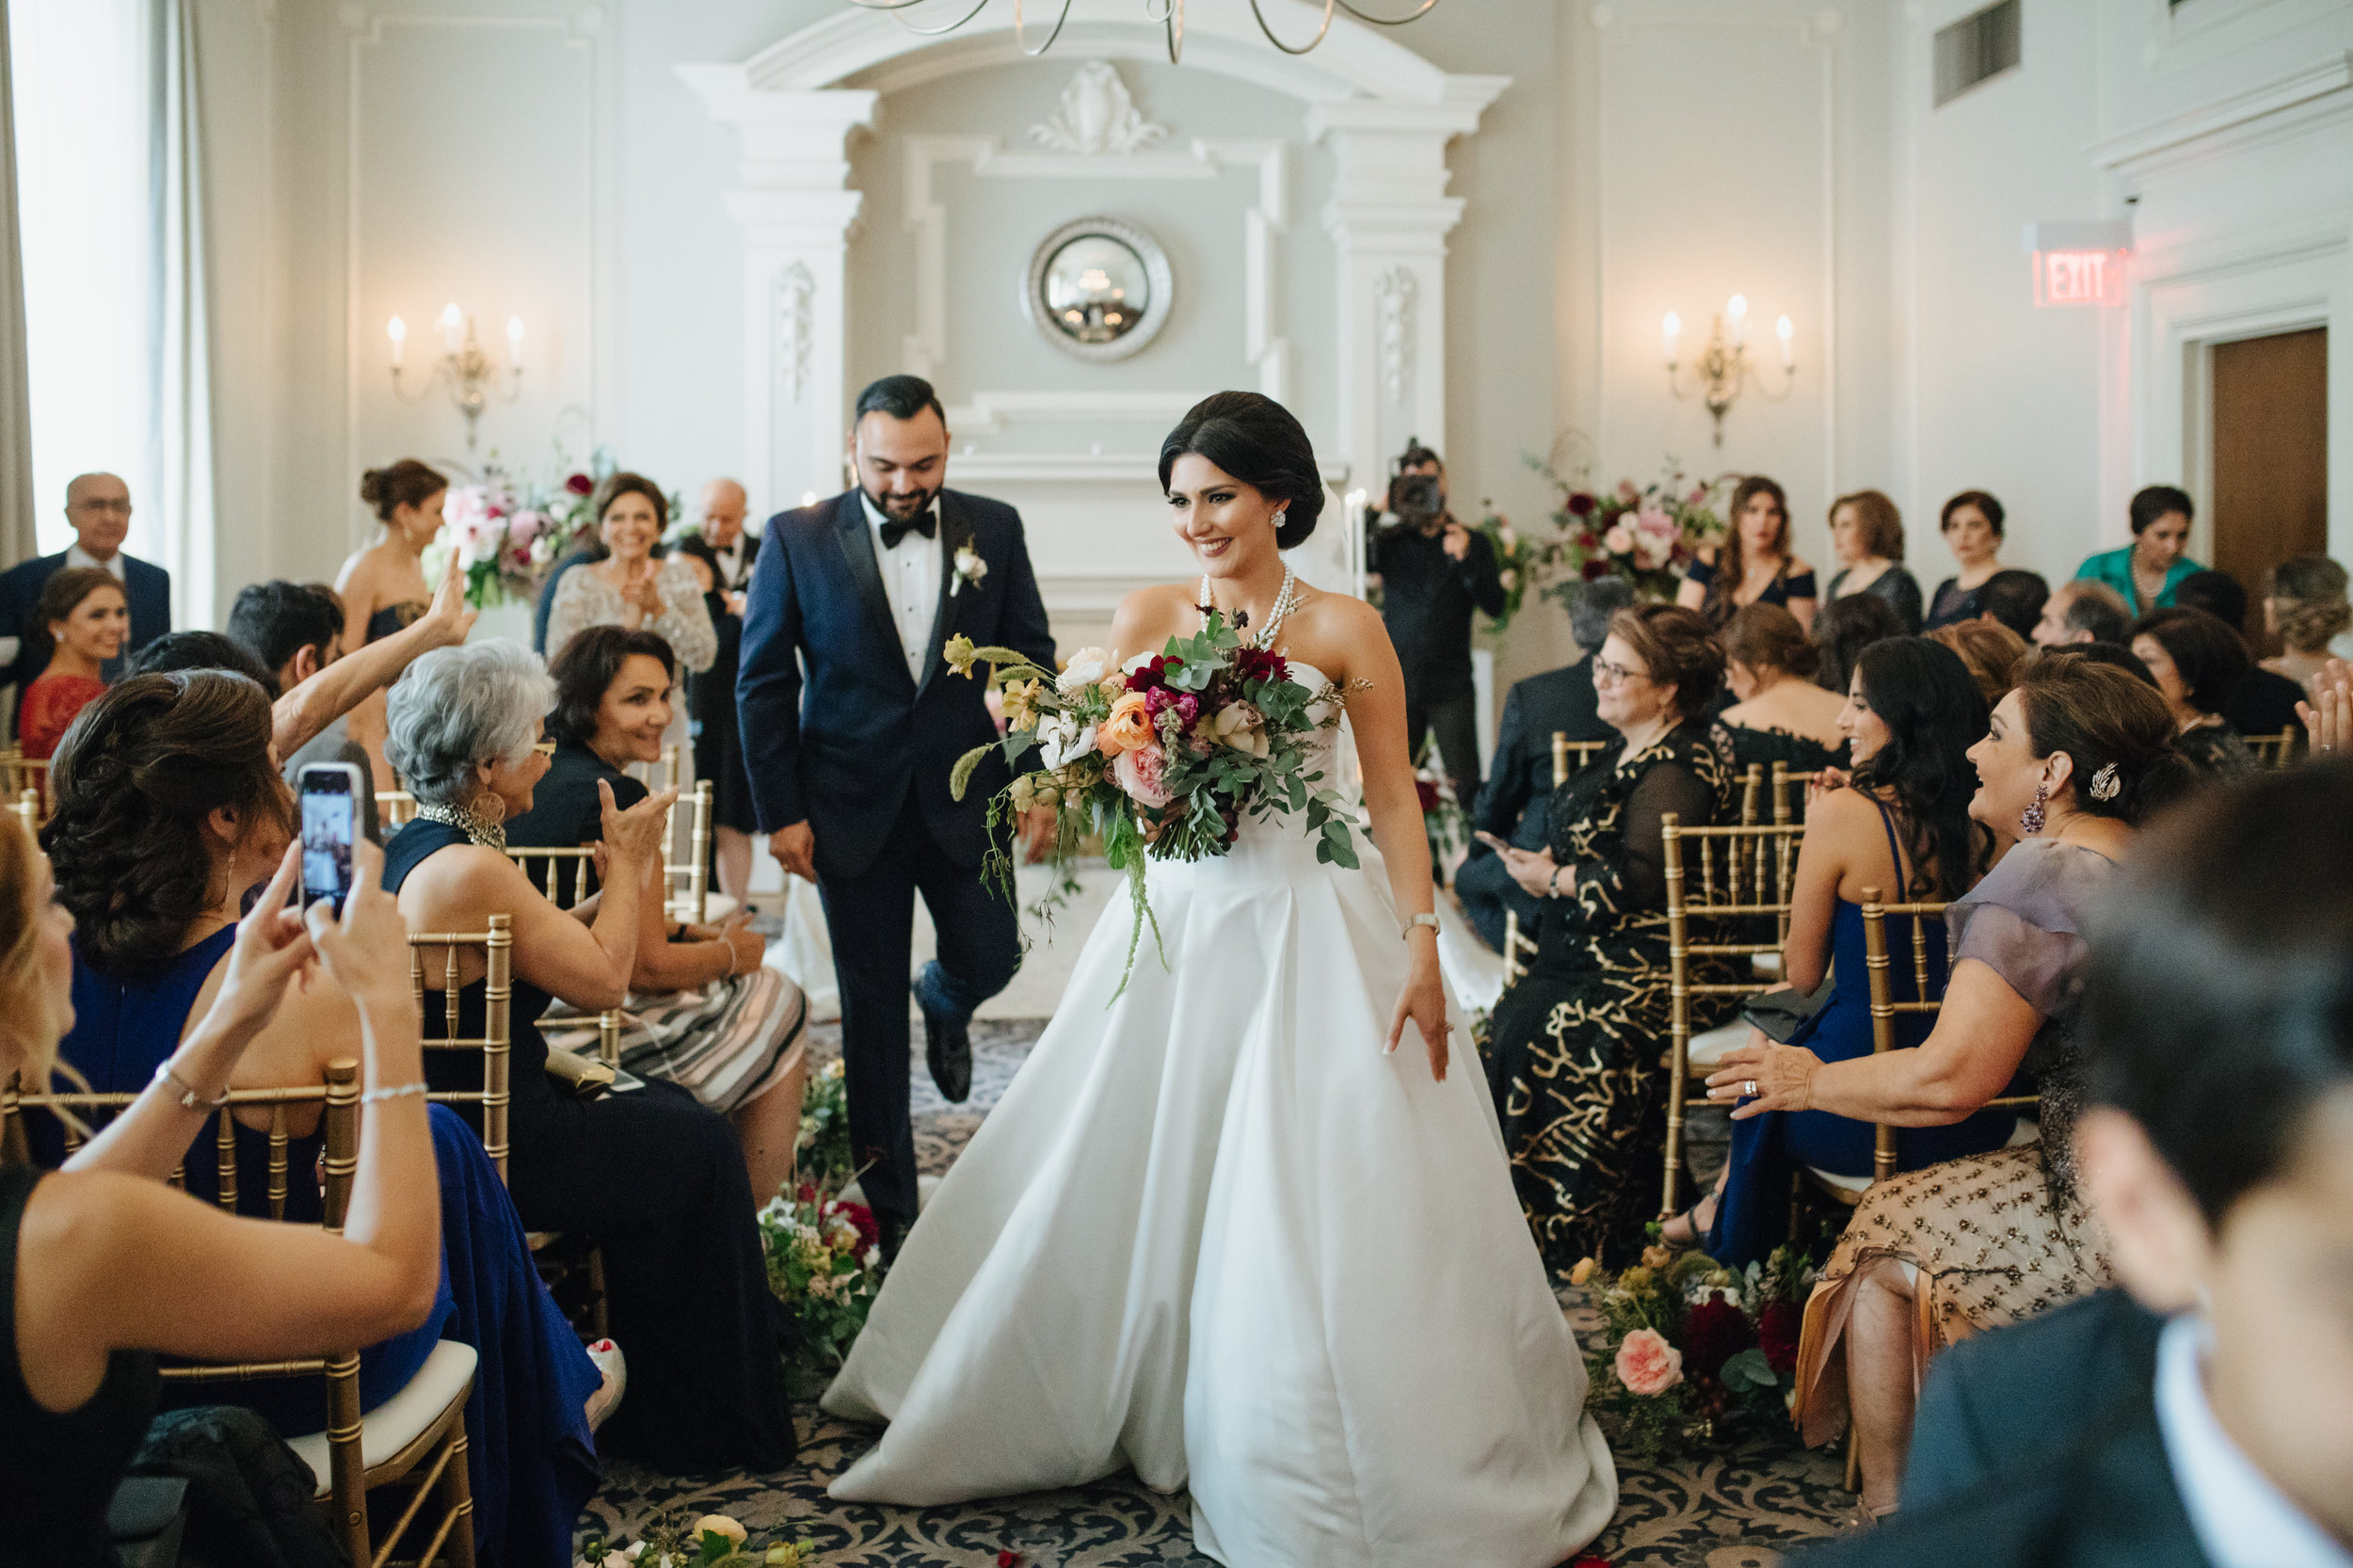 herastudios_wedding_mina_sina_hera_selects-75.jpg